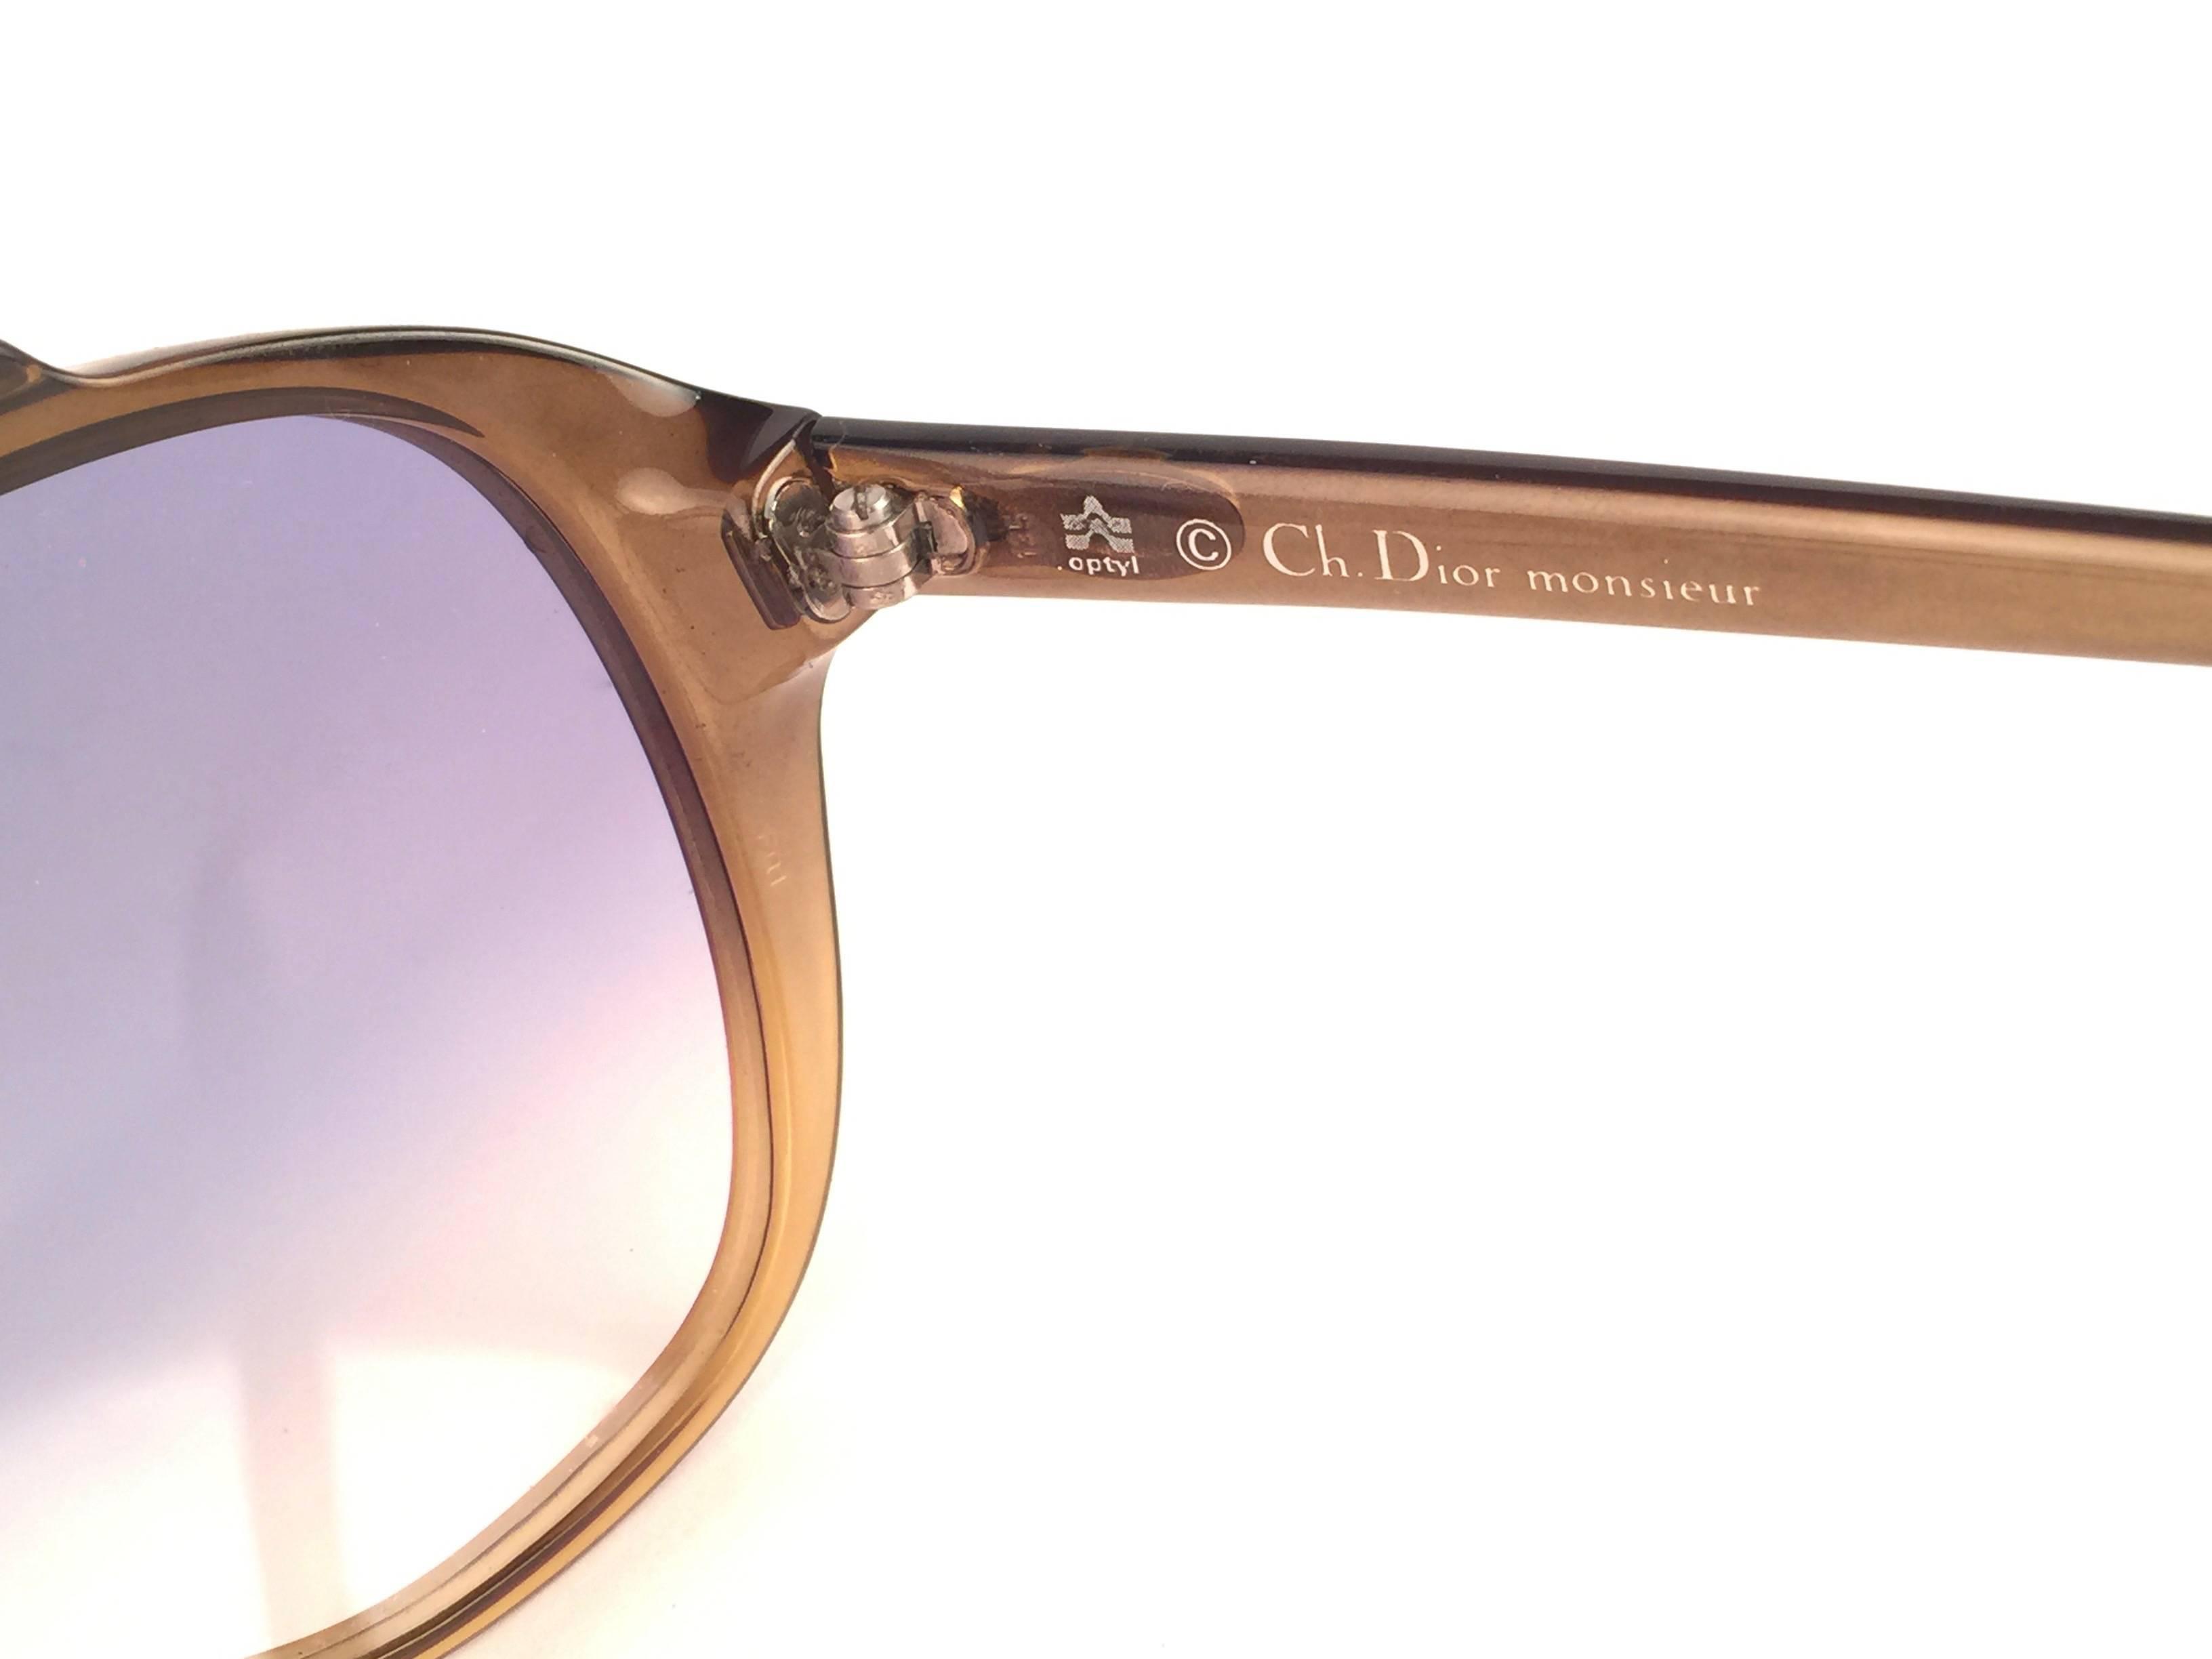 28ef2981e75 New Vintage Christian Dior Monsieur 2059 20 Blue Gradient 1970 Sunglasses  at 1stdibs